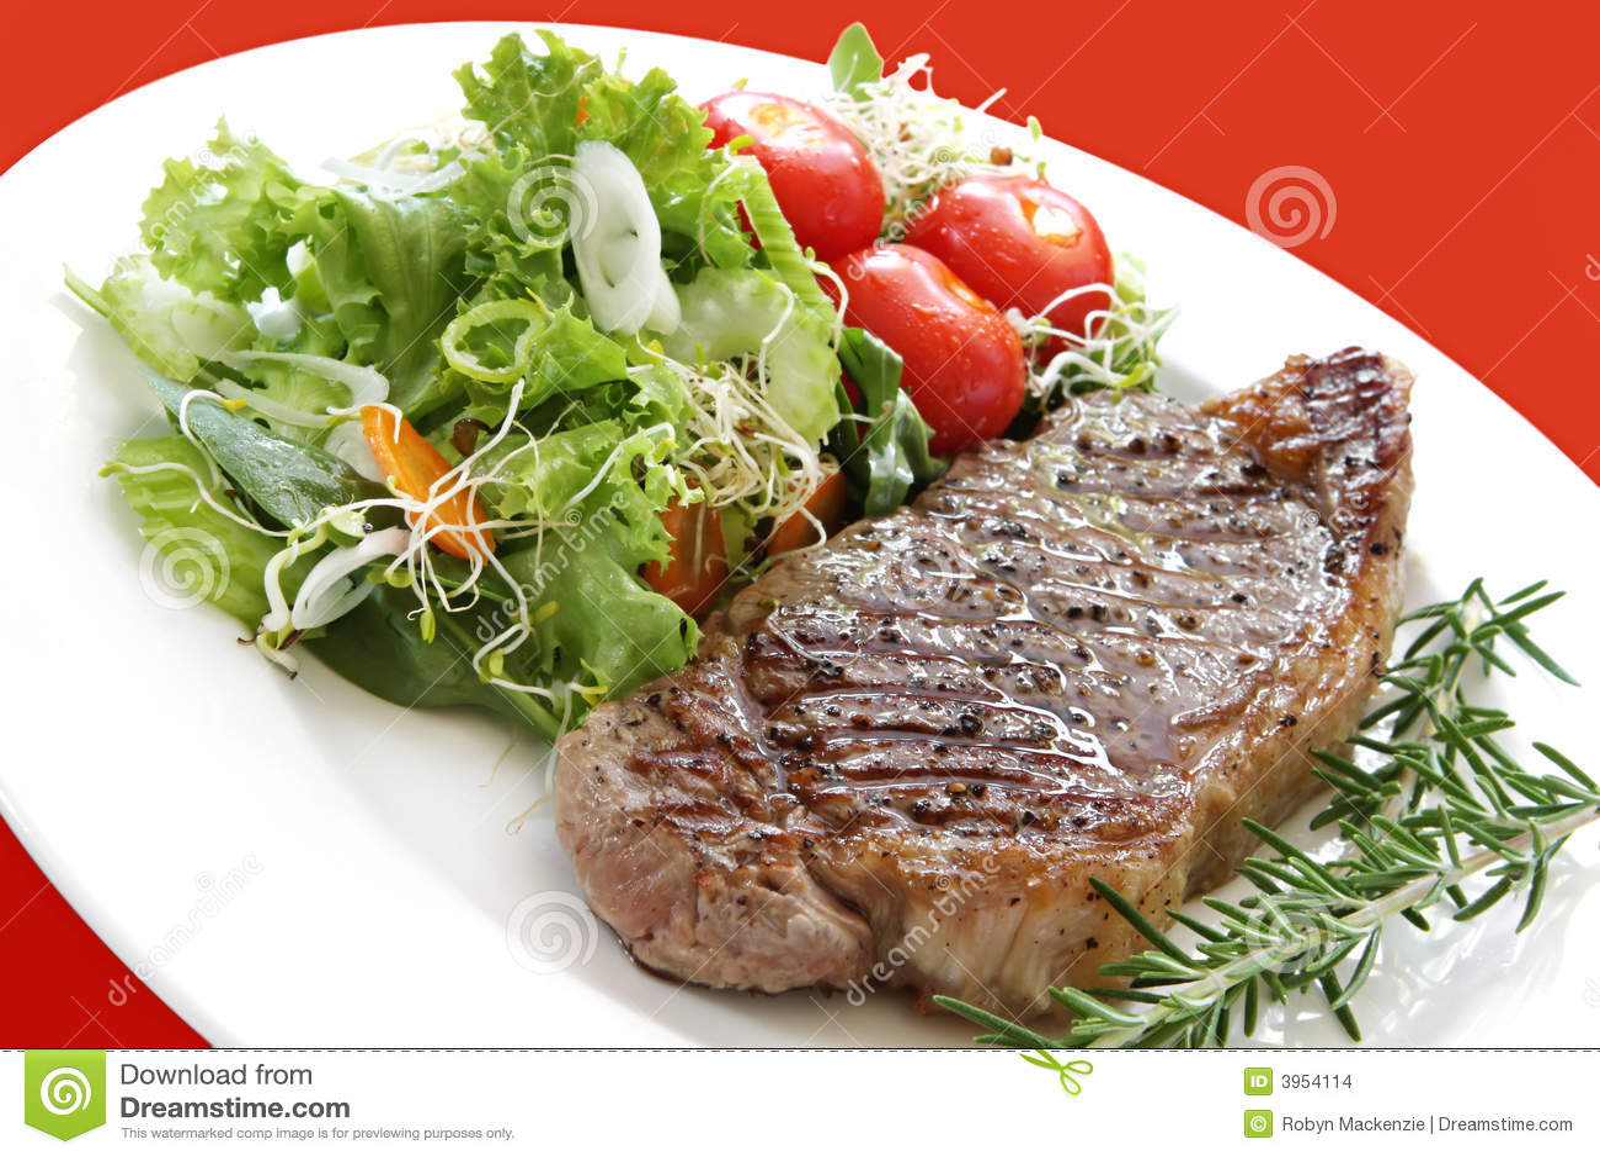 Porterhouse Steak with Grilled Salad forecast